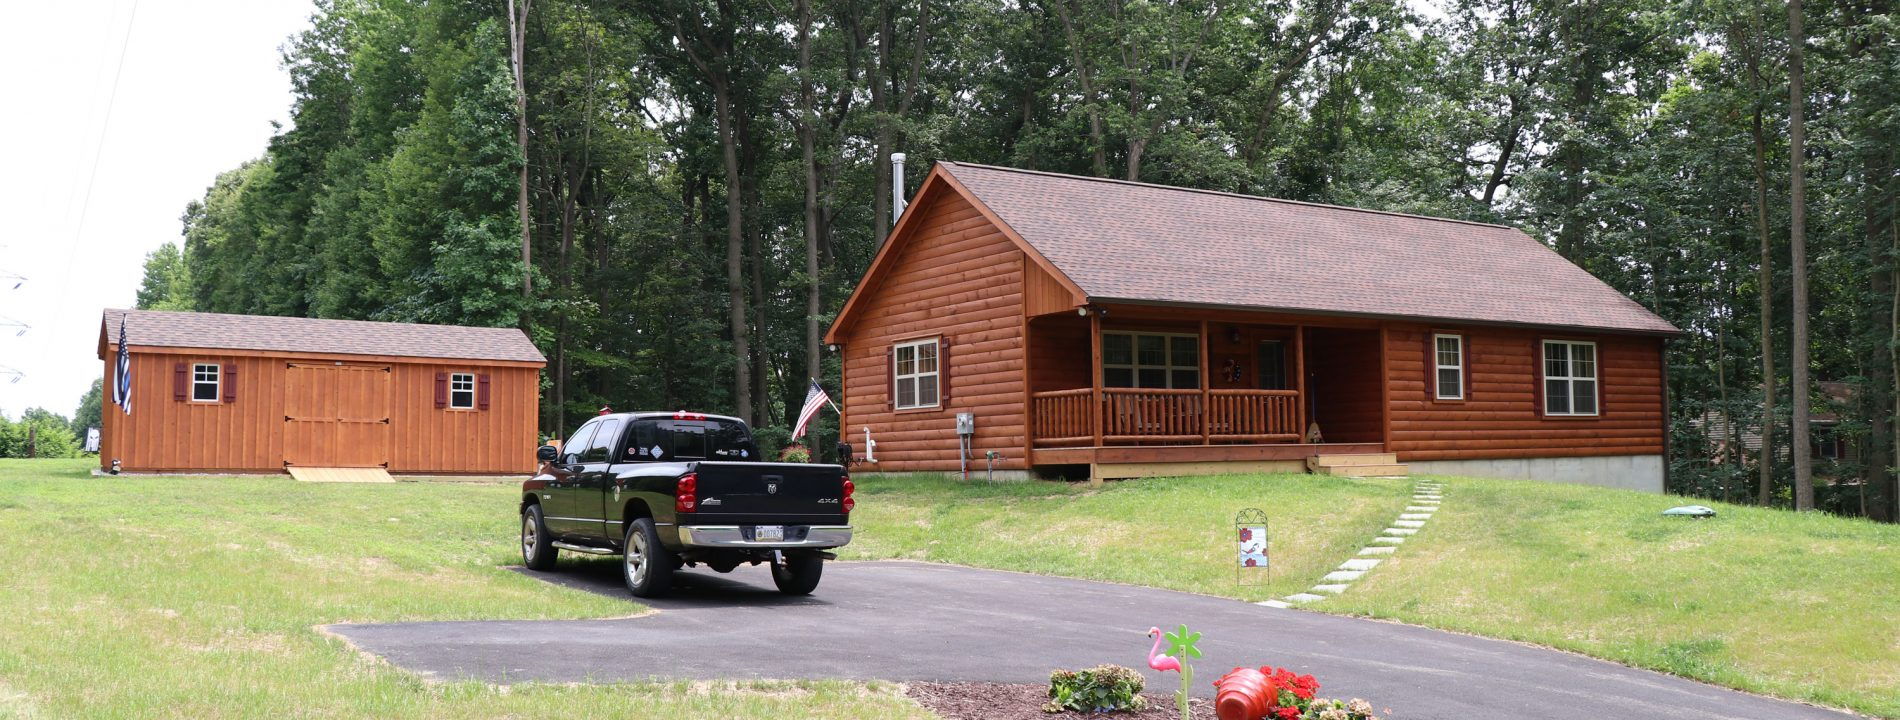 Wood Cabin Plans | Frontier Cabins Log Cabin Plans Prefab Floor Plans Zook Cabins